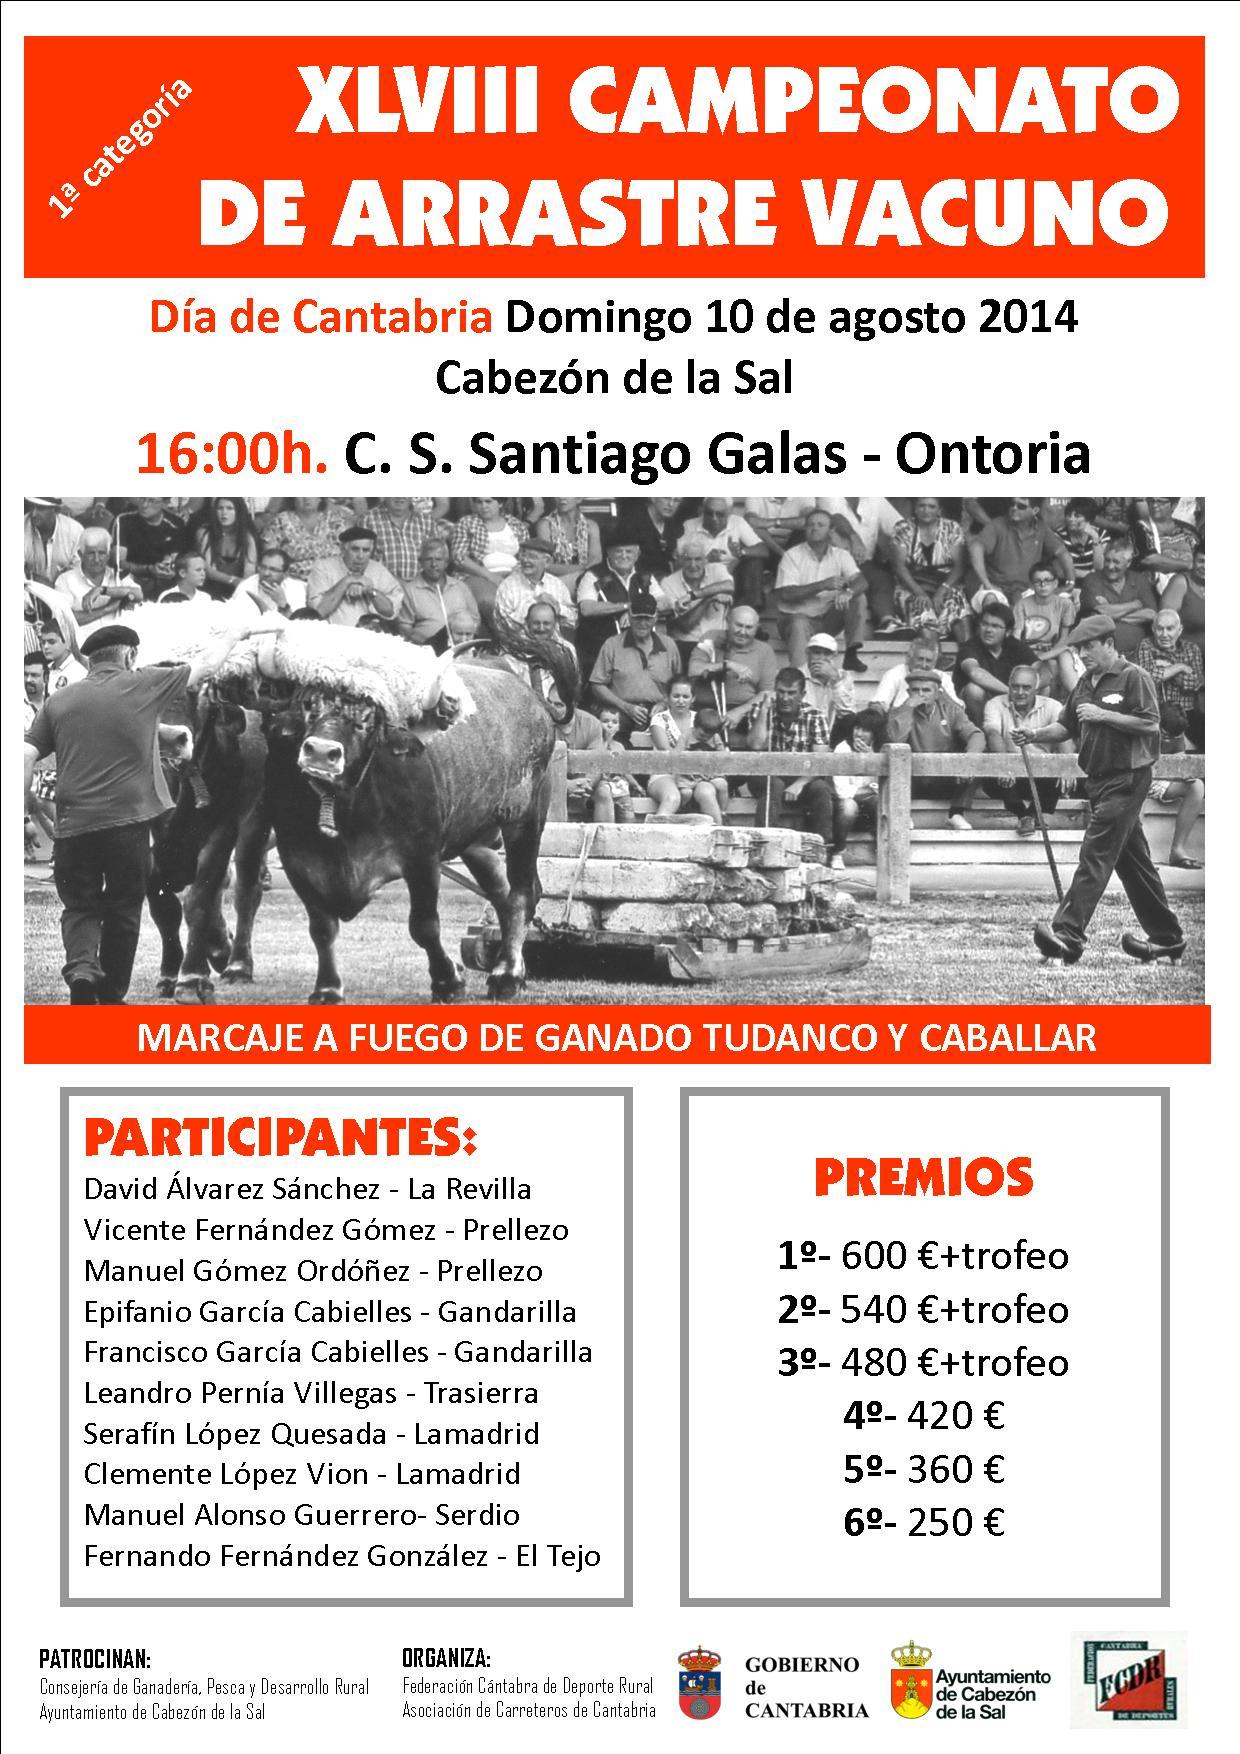 http://www.cabezondelasal.net/wp-content/uploads/2014/08/cartel-arrastre-color-2014.jpg